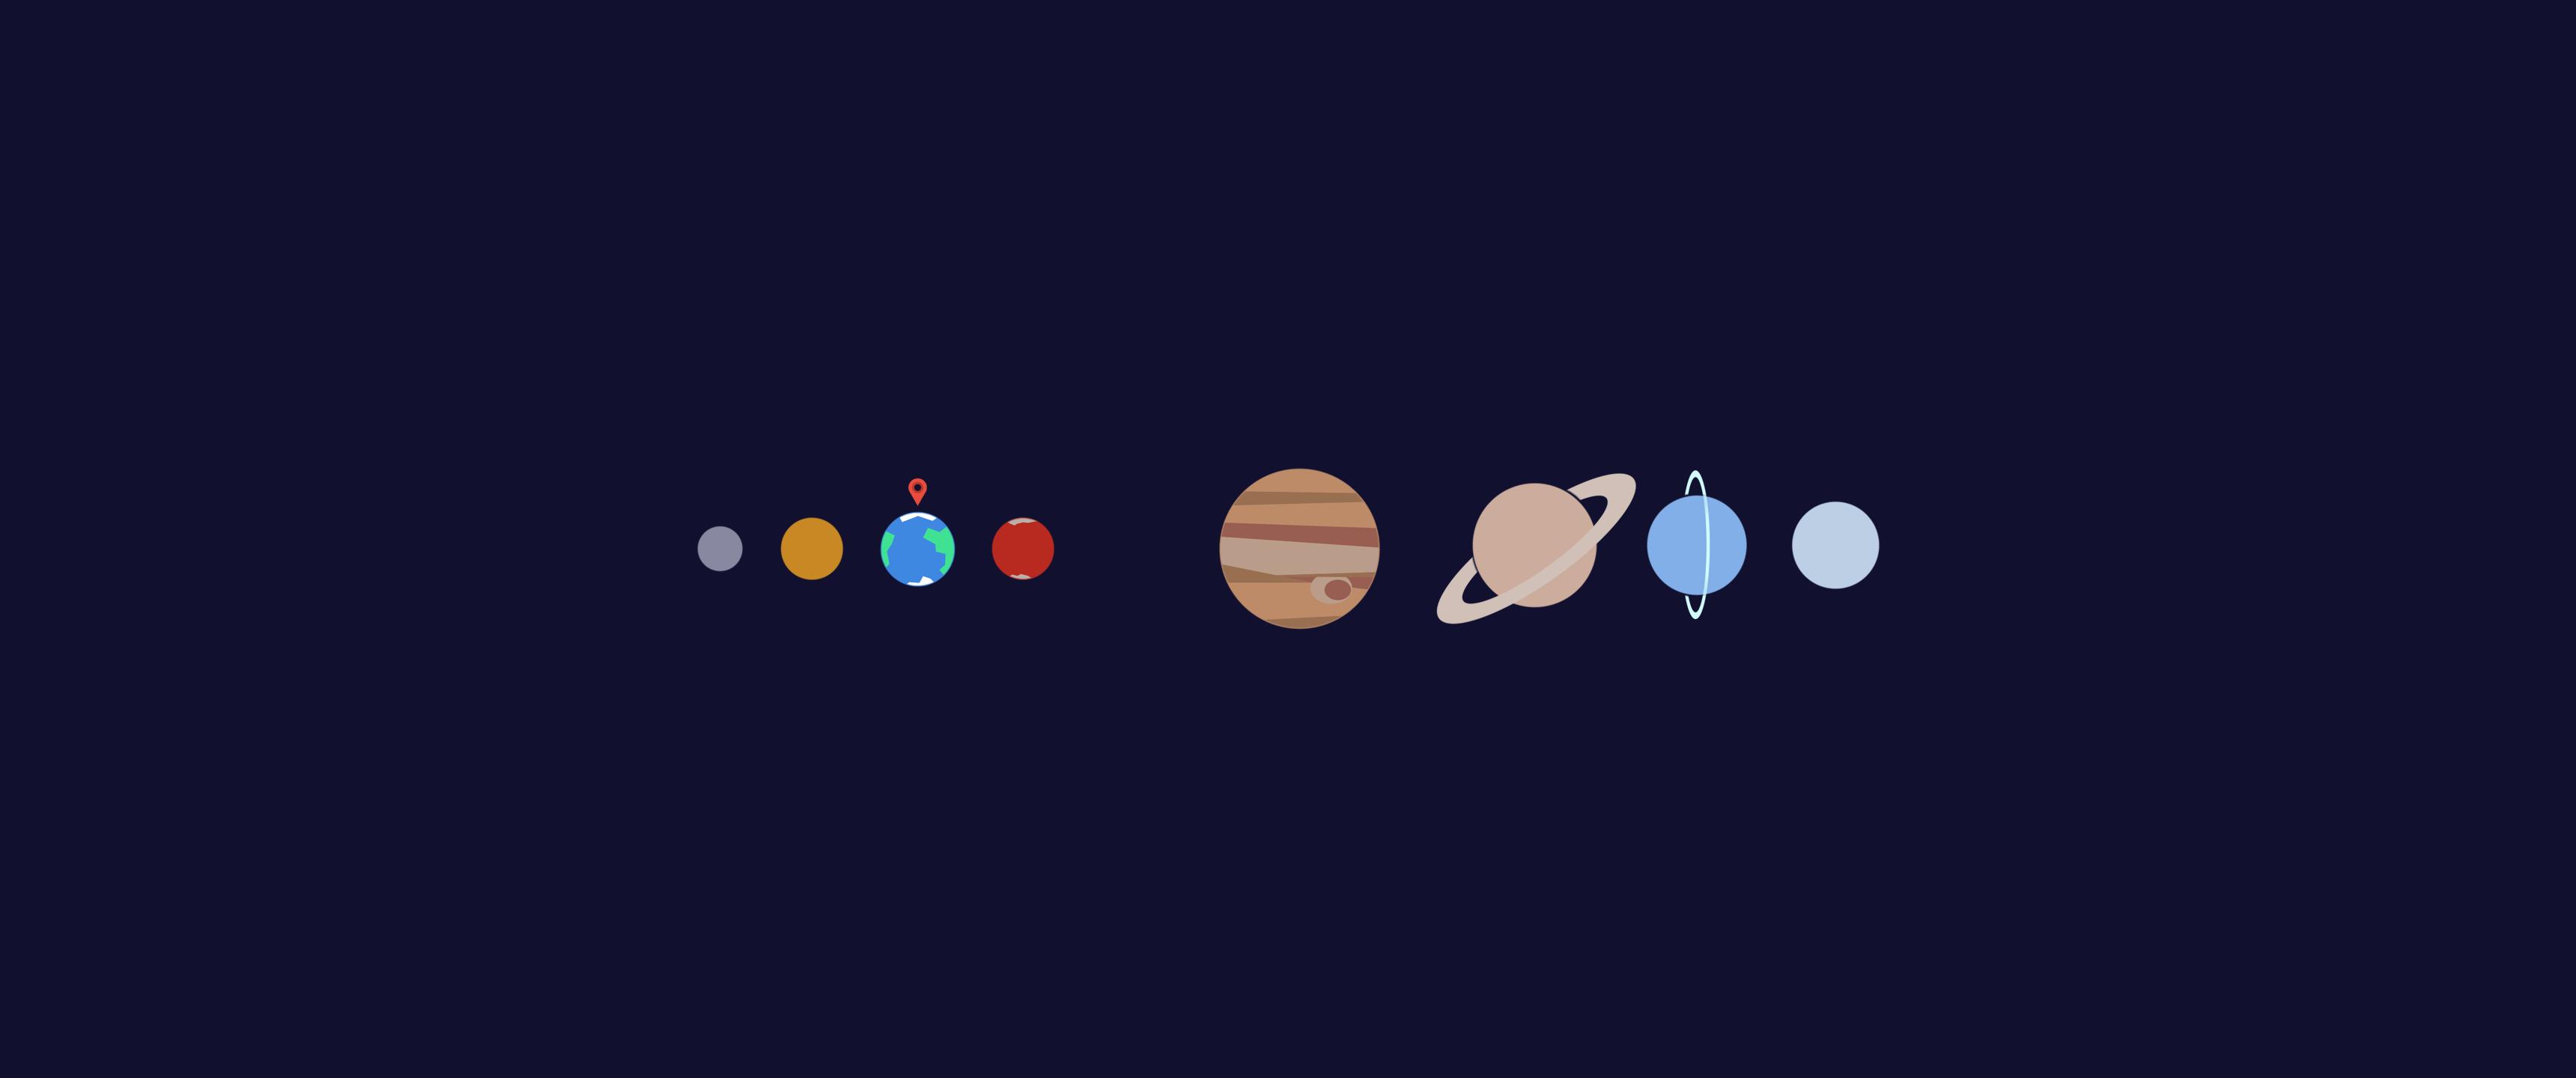 General 3440x1440 Solar System planet Earth Saturn Uranus Neptune Mars Venus Jupiter Mercury digital art space